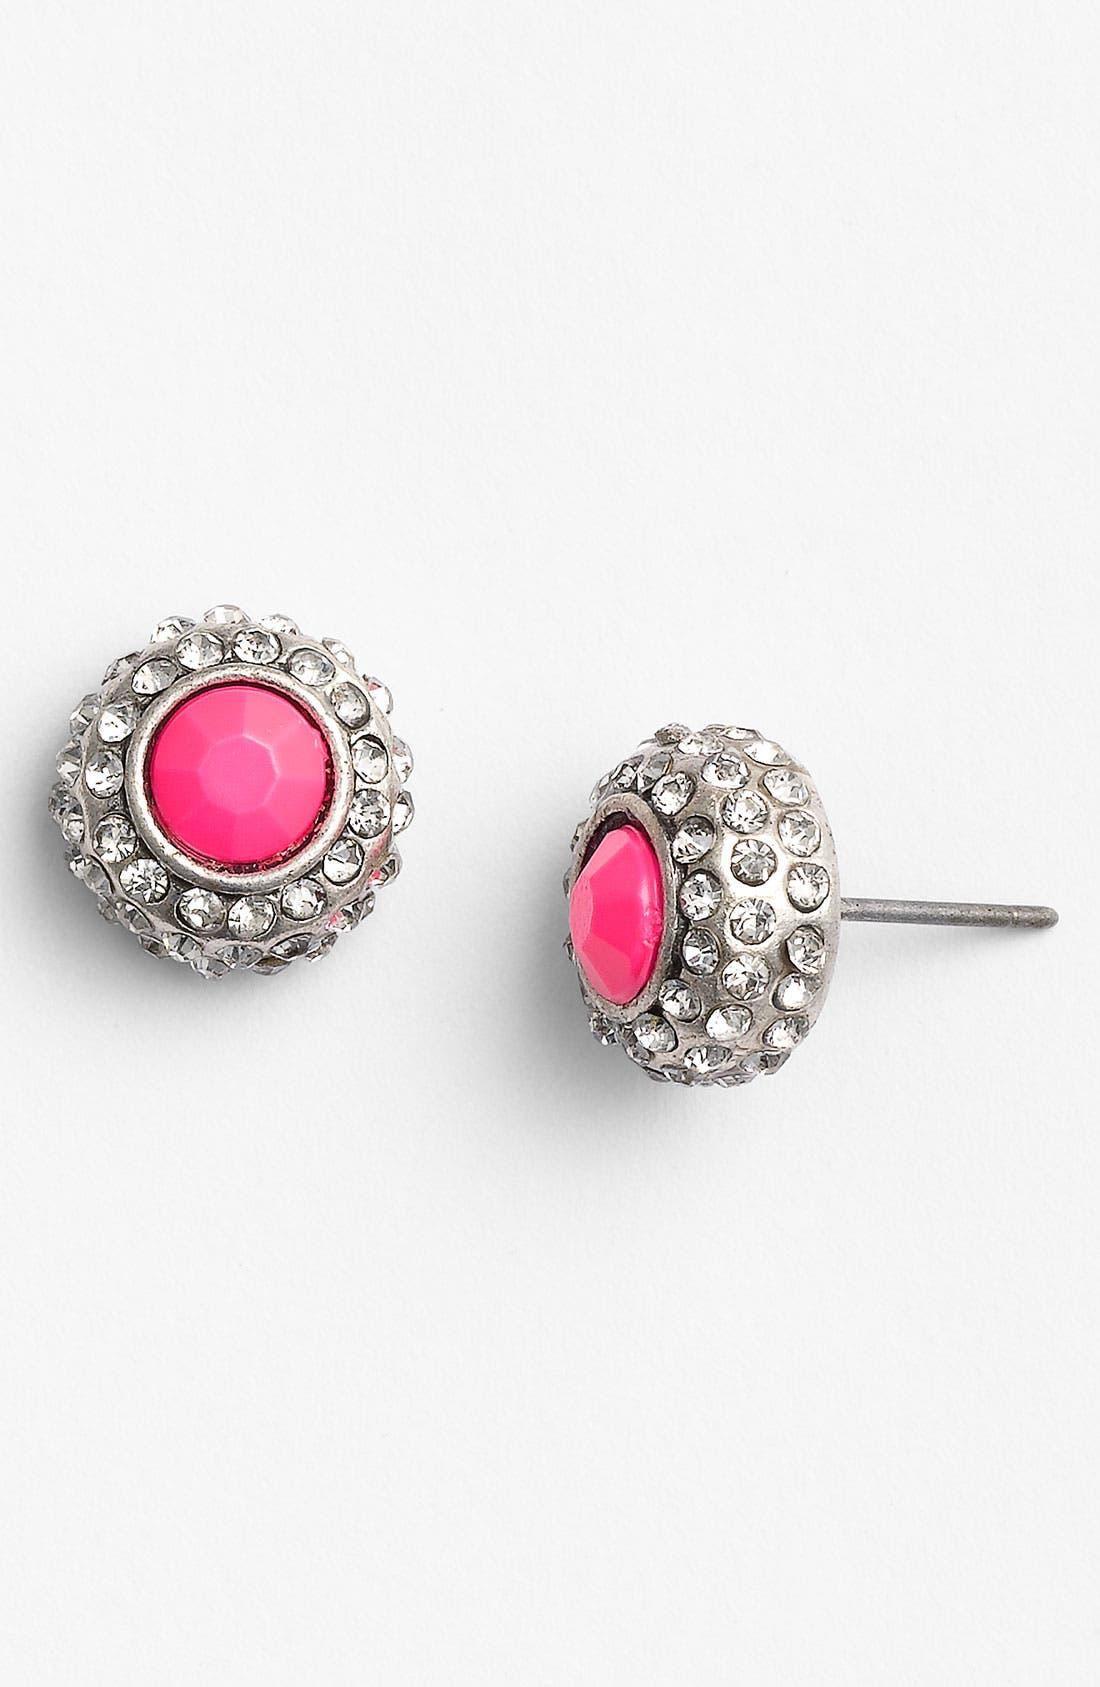 Main Image - Carole Neon Rhinestone Stud Earrings